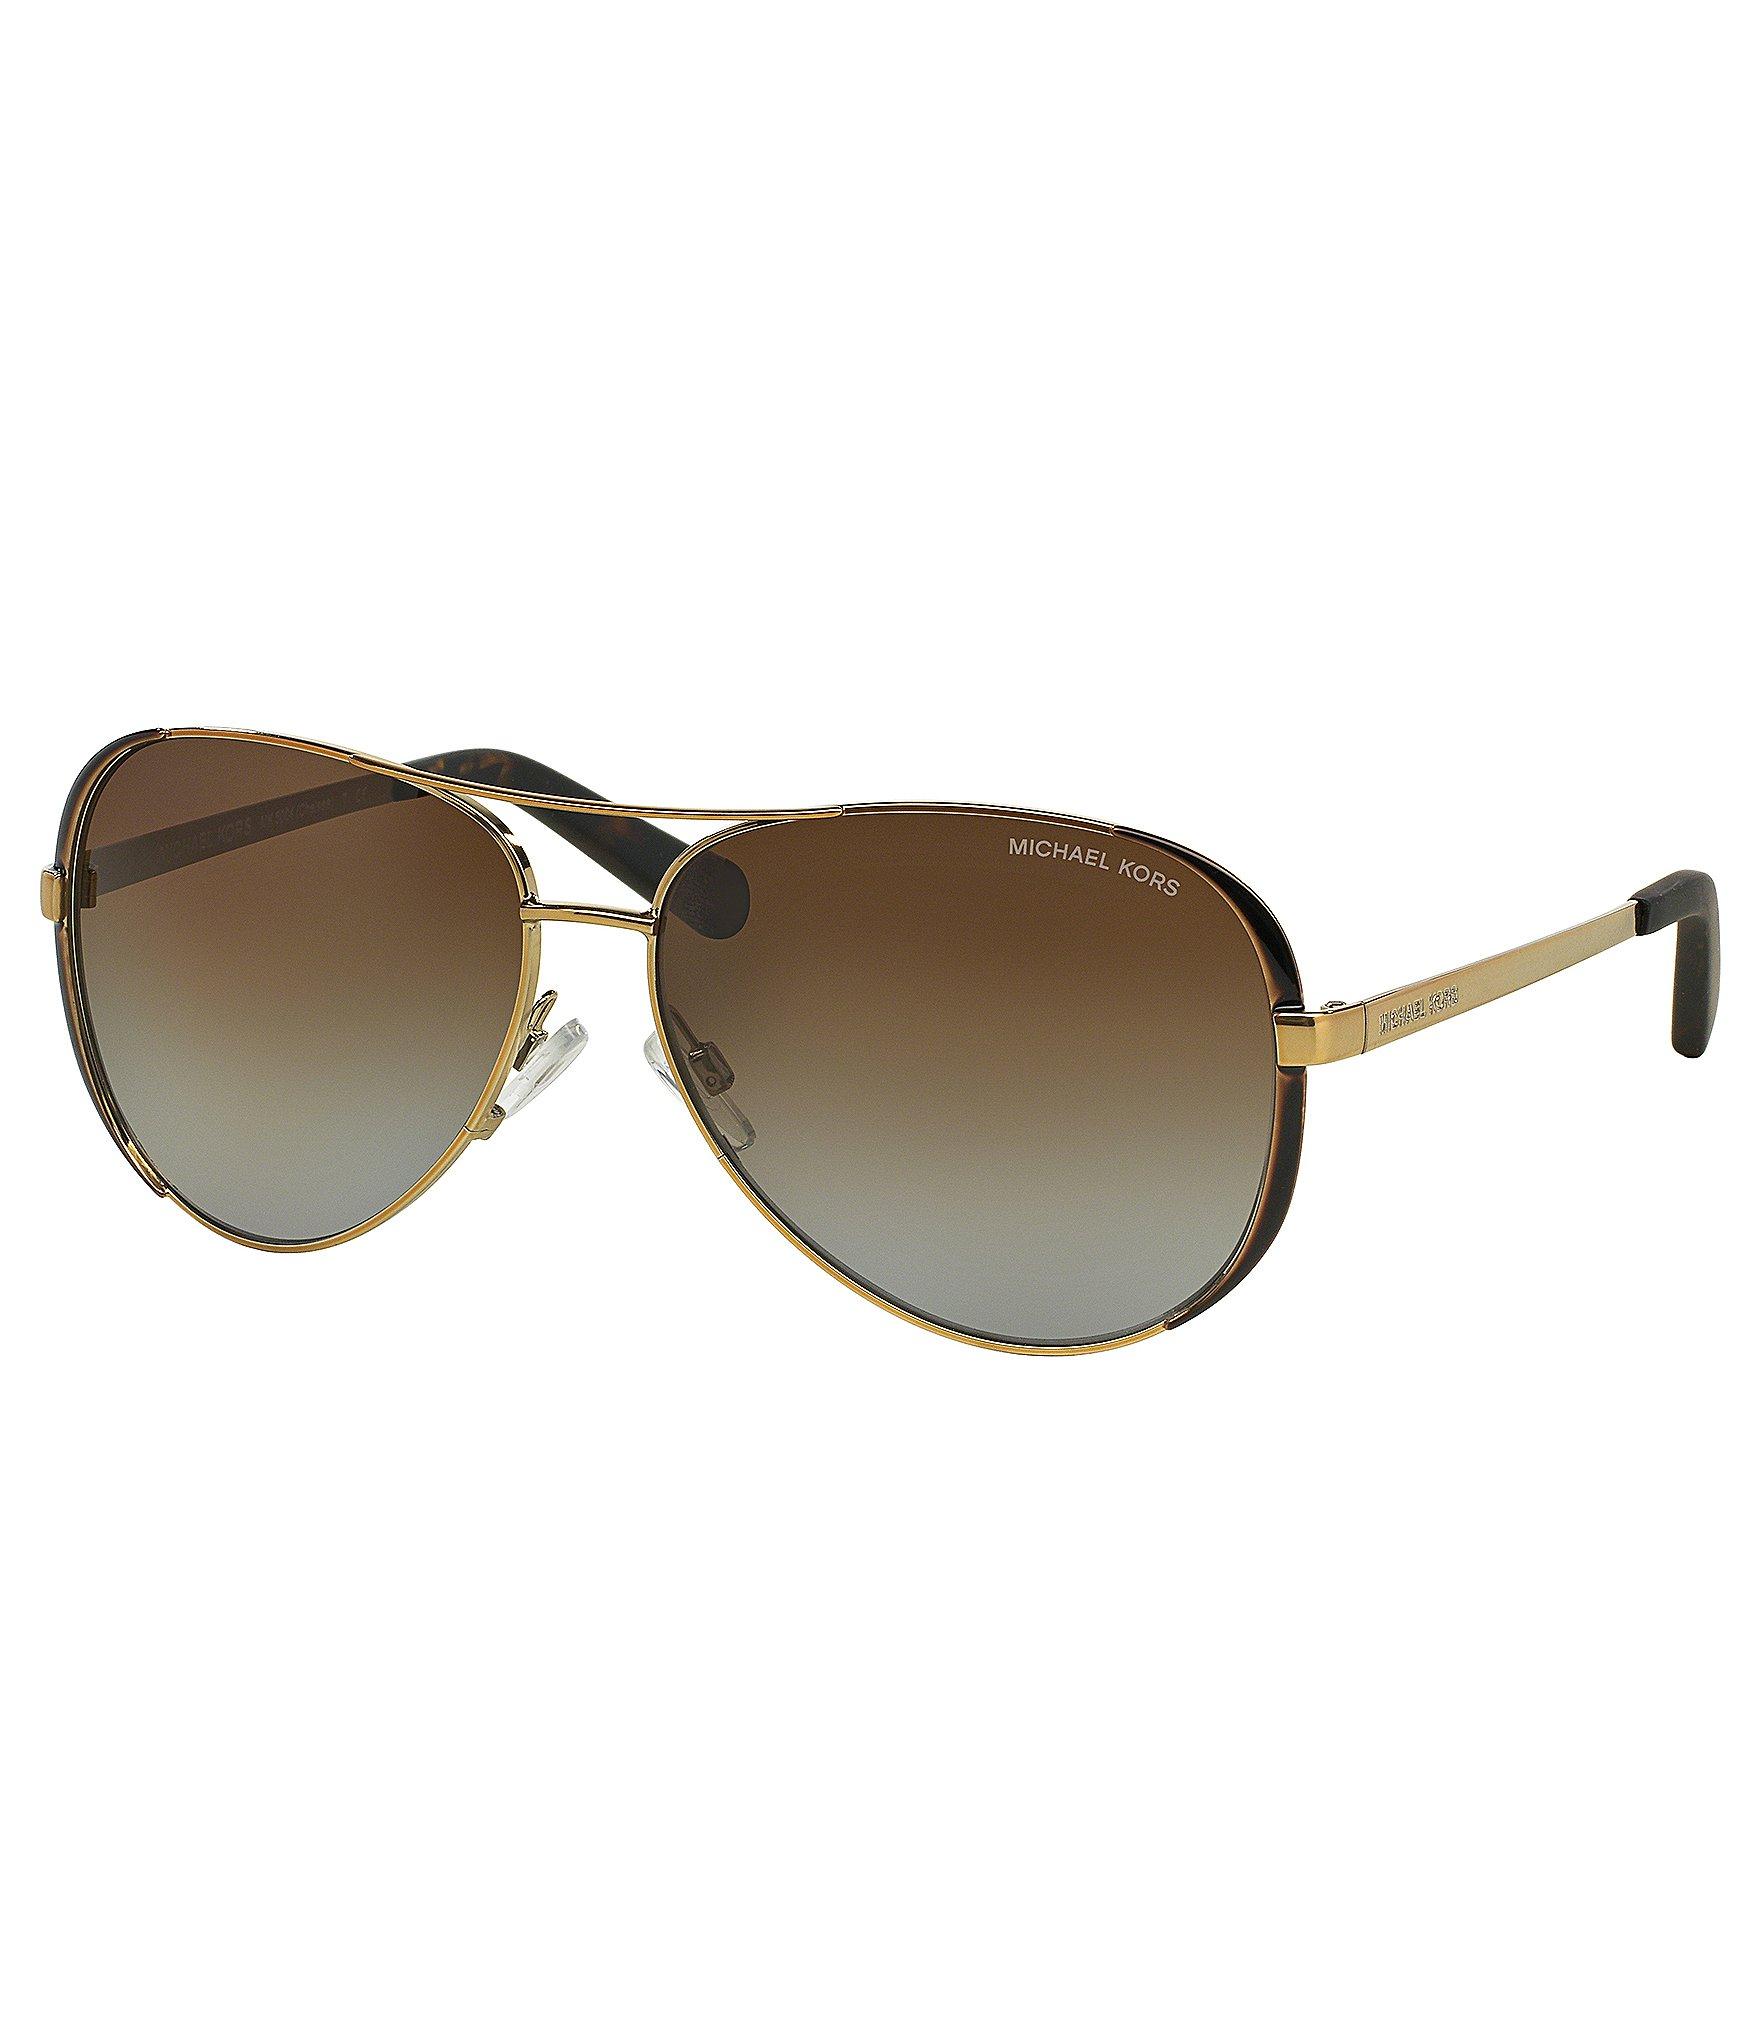 michael kors chelsea polarized aviator sunglasses dillards. Black Bedroom Furniture Sets. Home Design Ideas